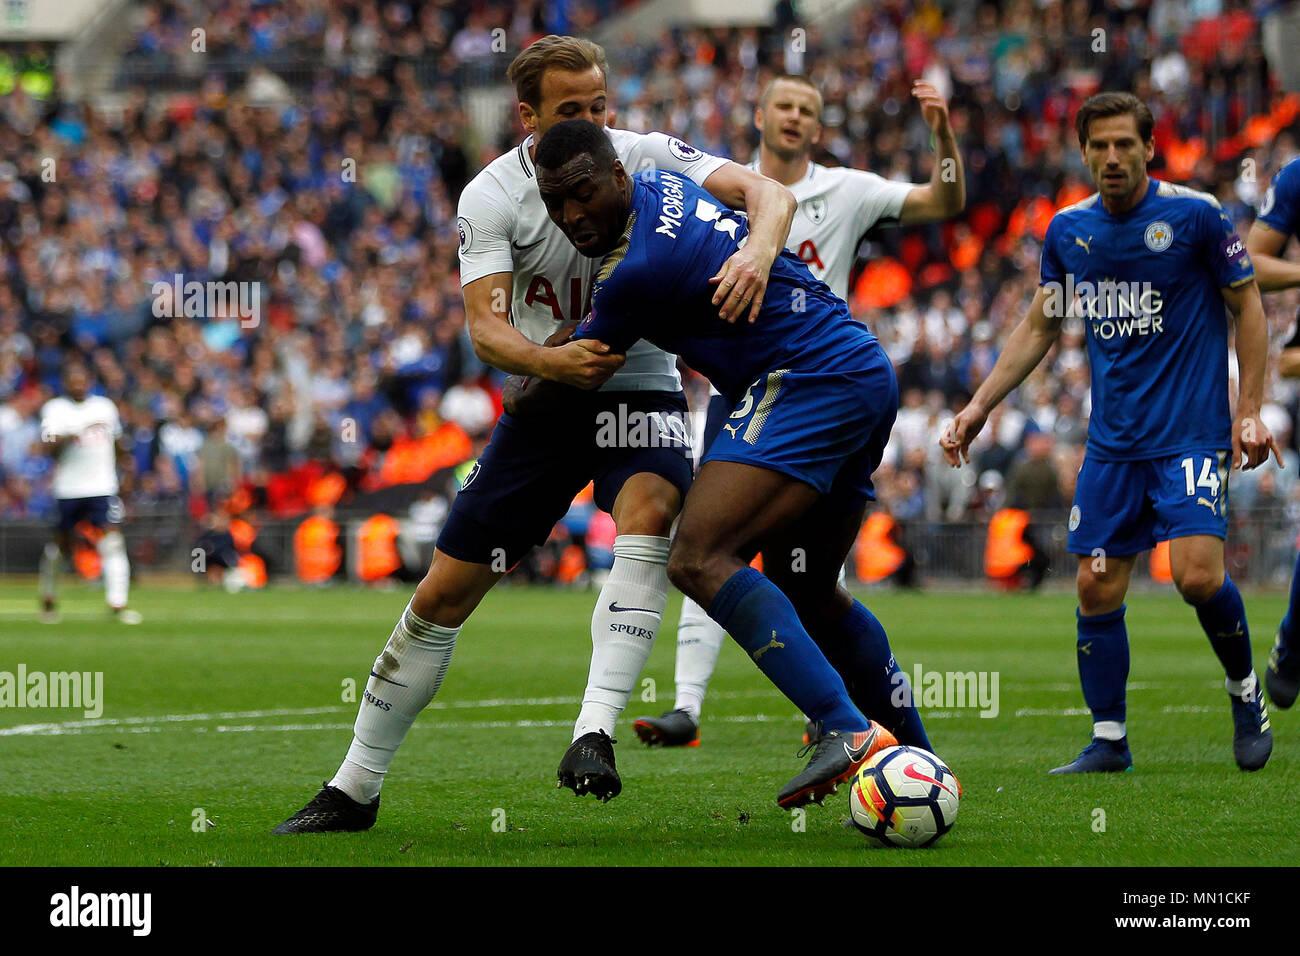 London, UK. 13th May, 2018. Harry Kane Of Tottenham